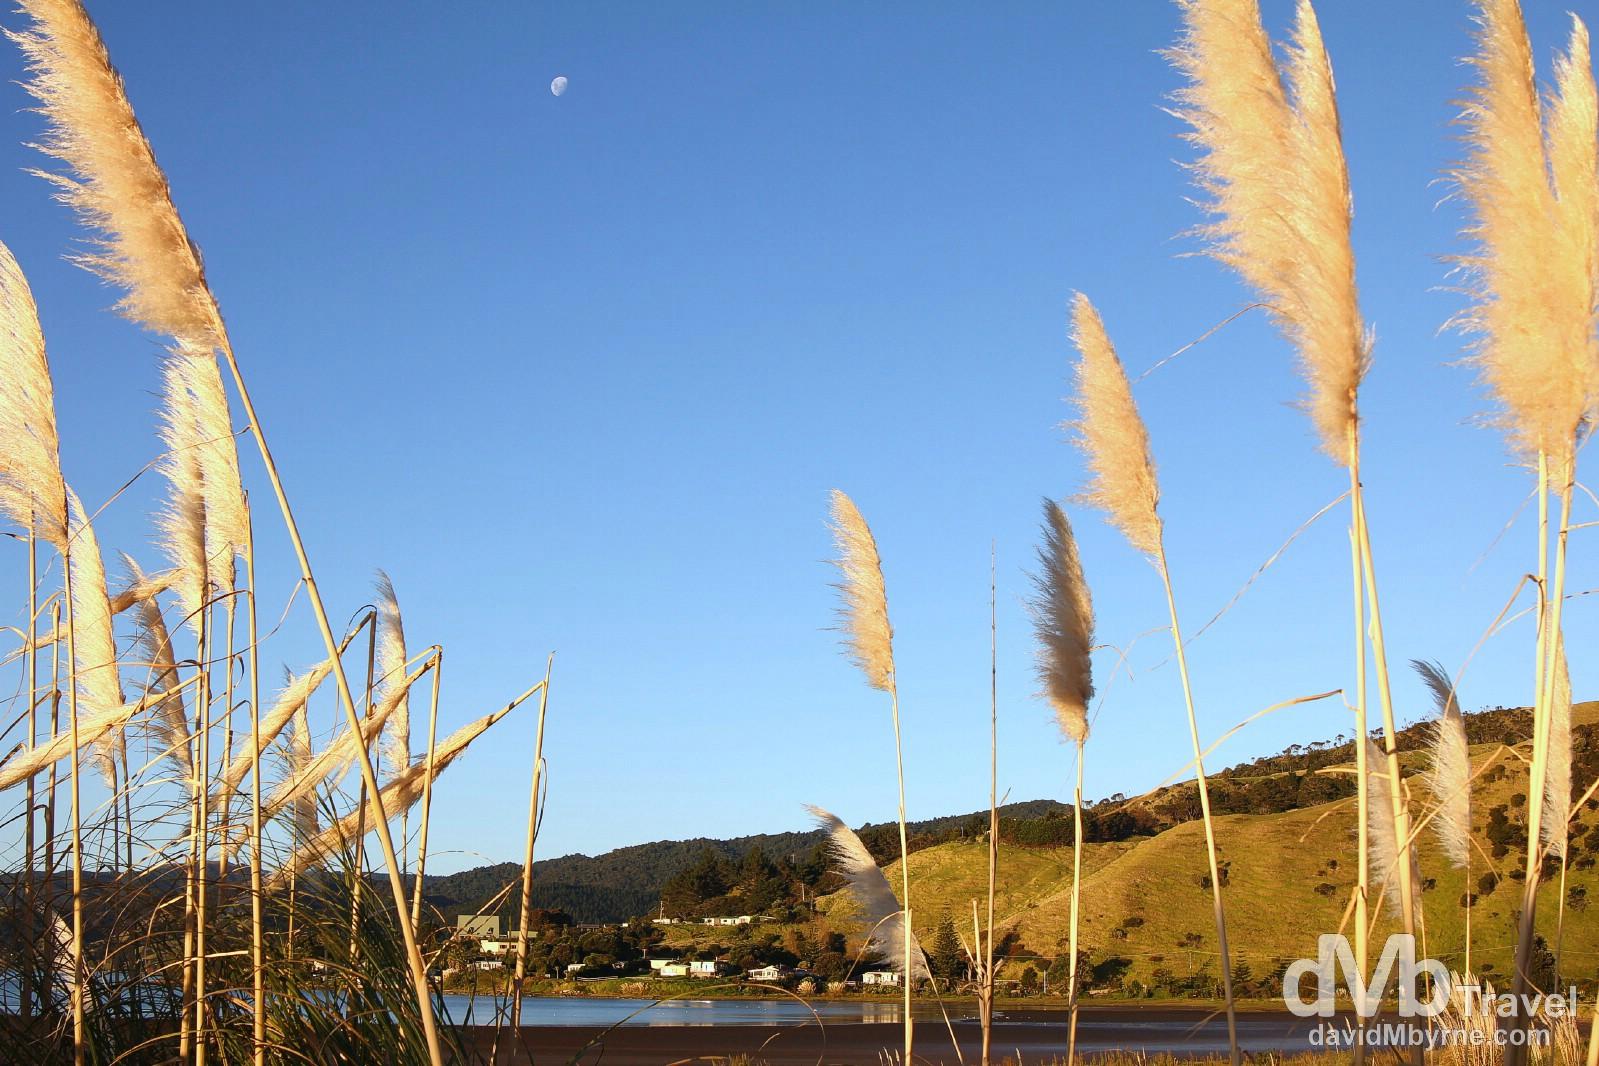 Late afternoon sunlight bathing Port Waikato, North Island, New Zealand. May 2nd 2012.